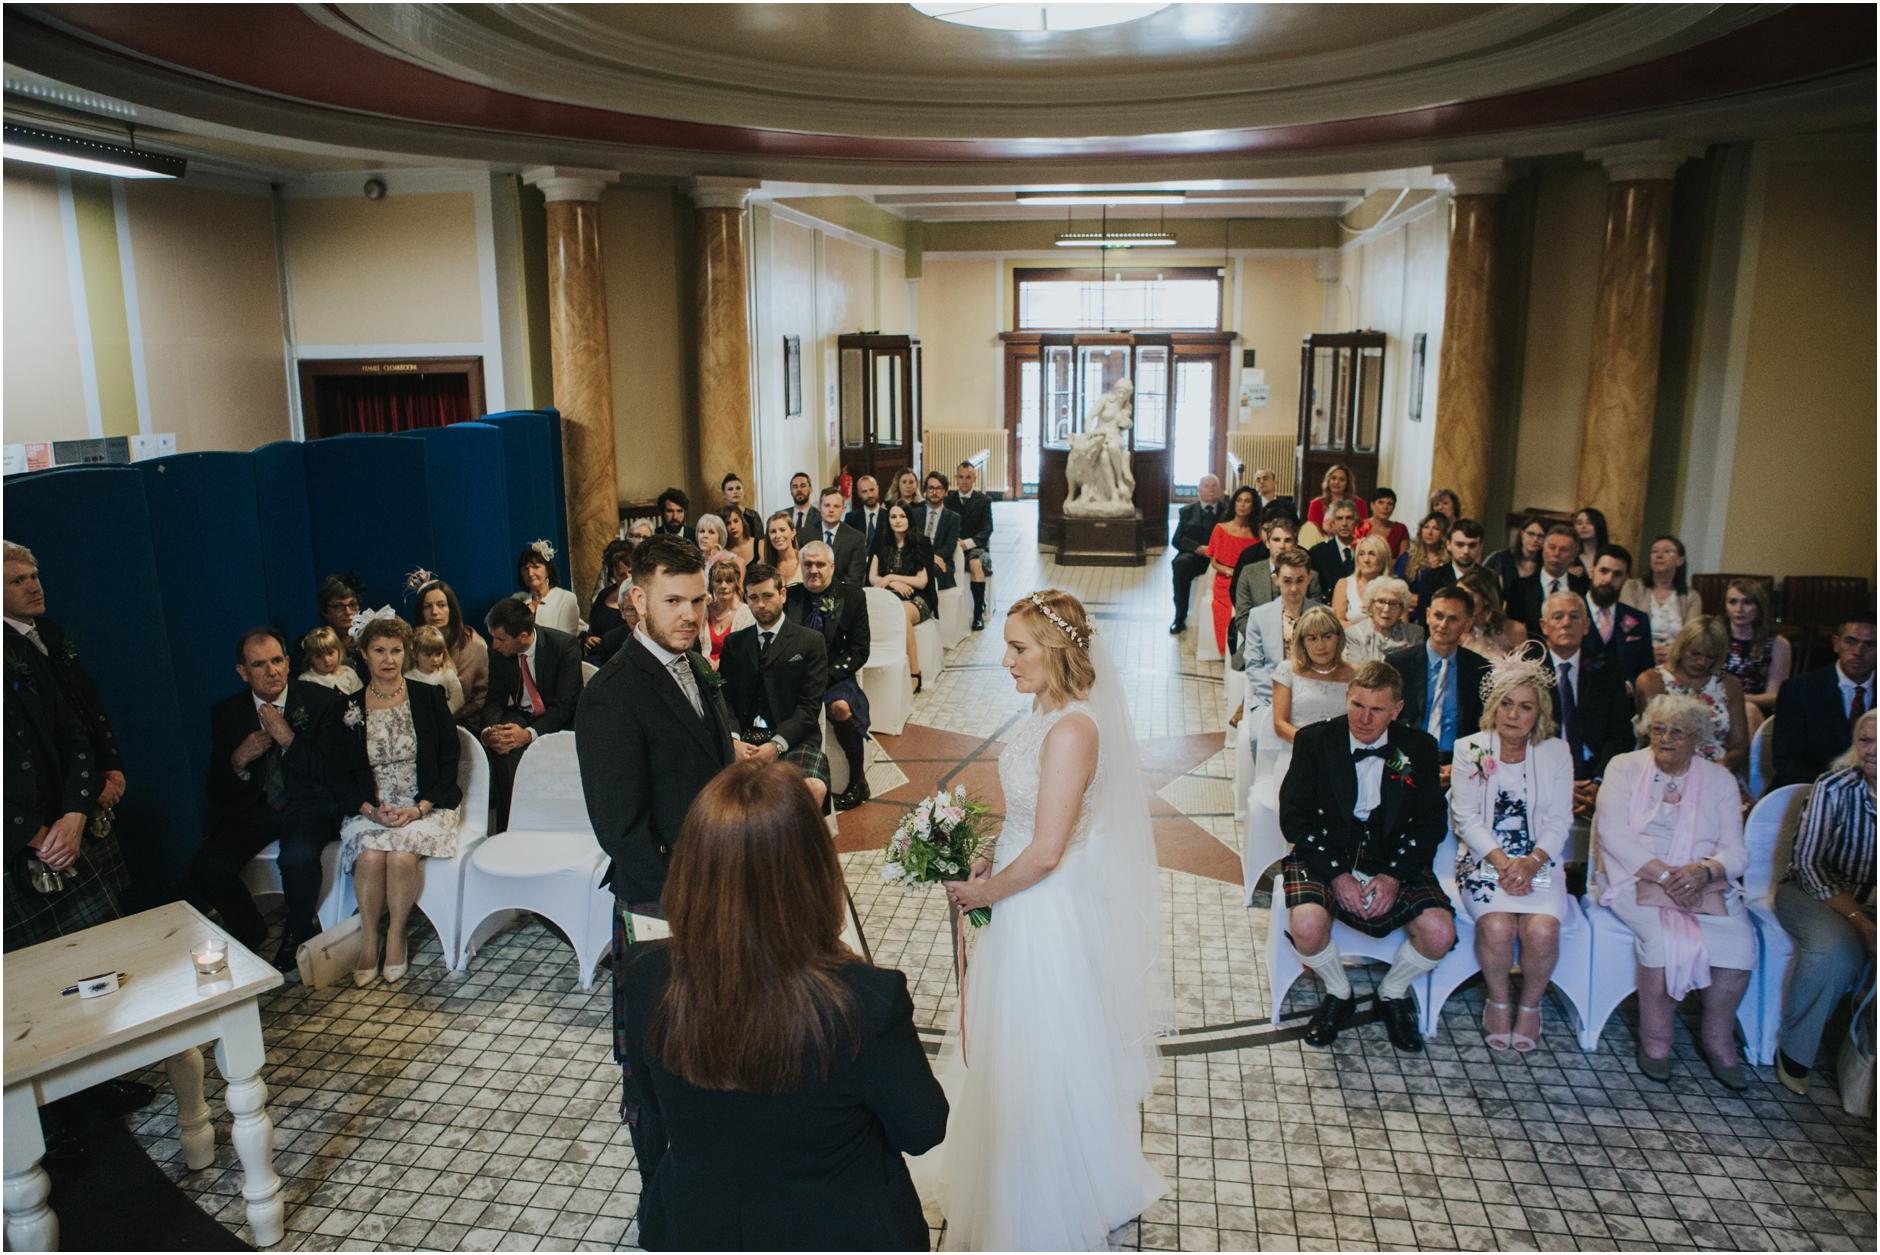 thomas morton hall leith theatre wedding venues edinburgh